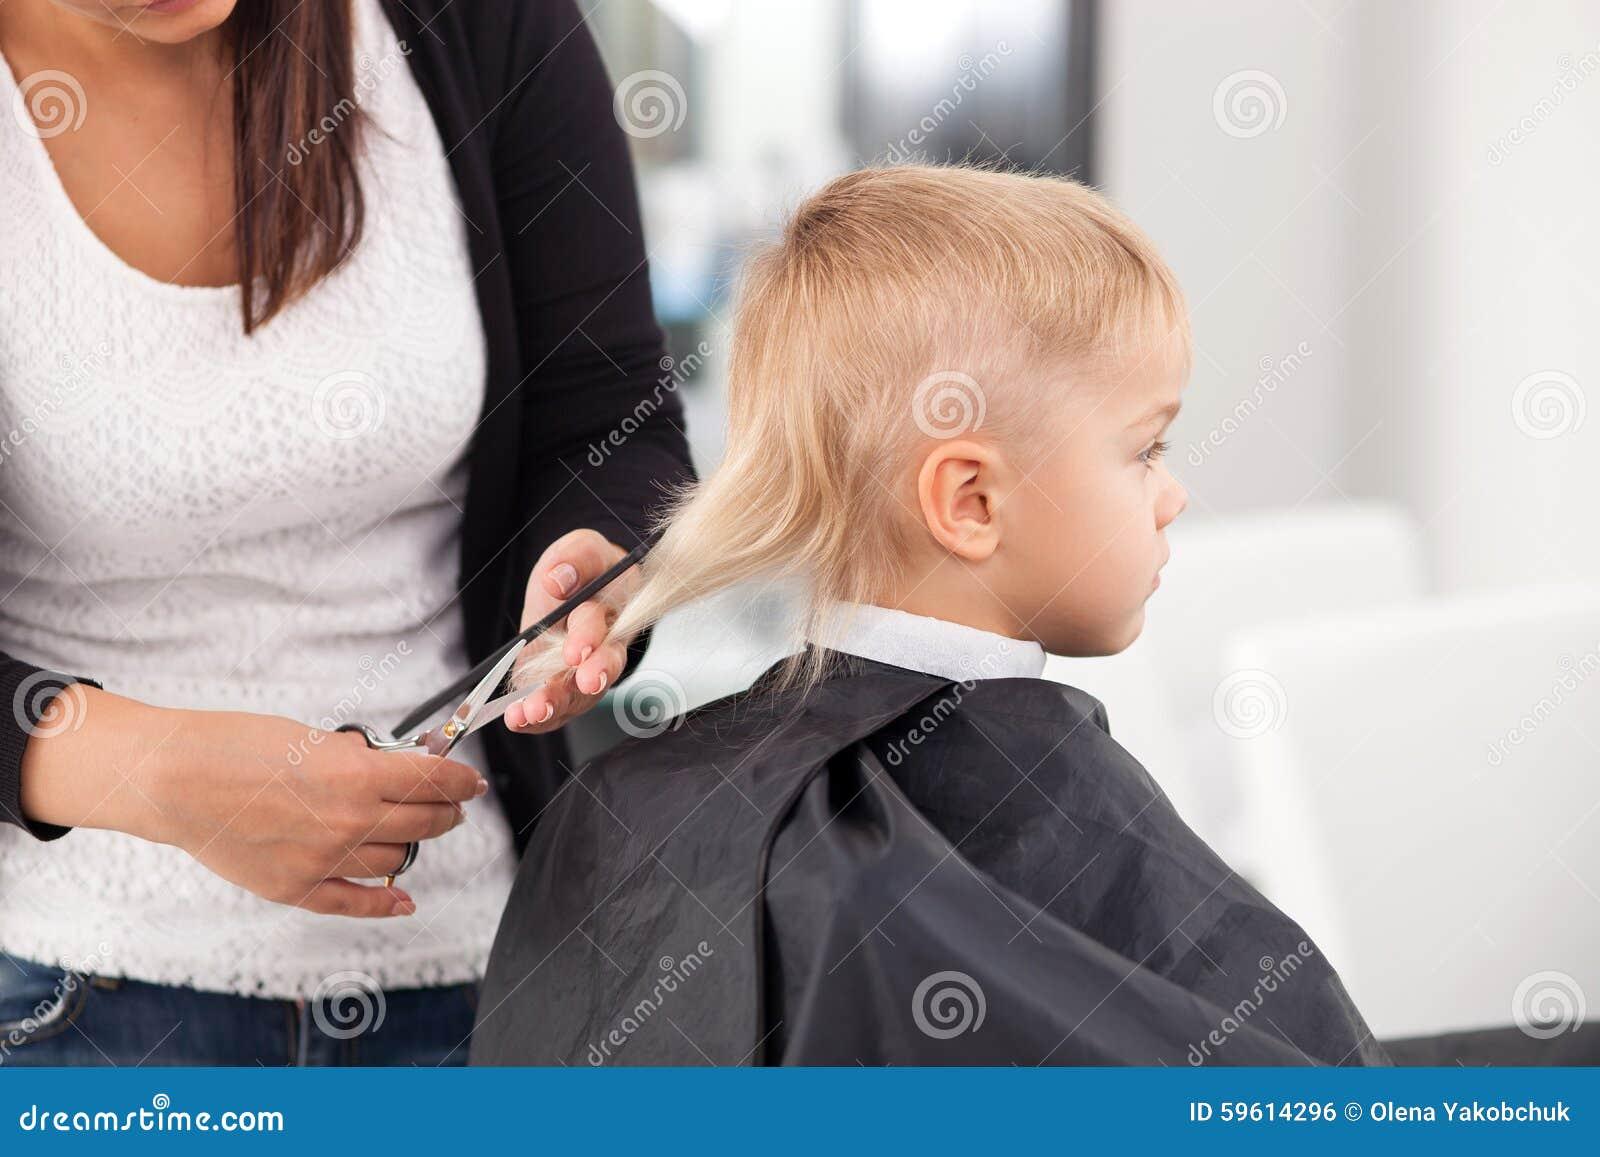 Professional Young Hairdresser Is iCuttingi iHairi Of Stock